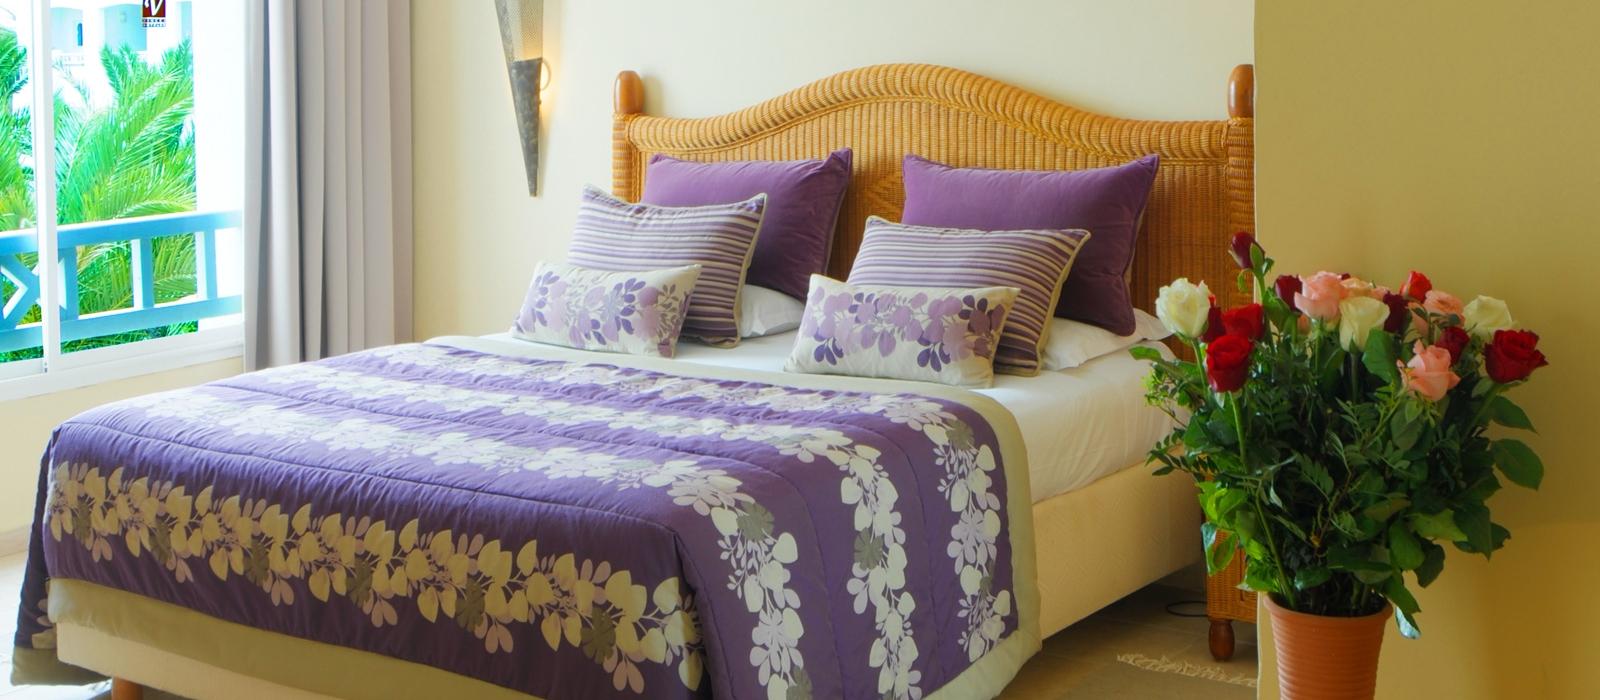 Rooms Hotel Vincci Djerba Resort - Single Room